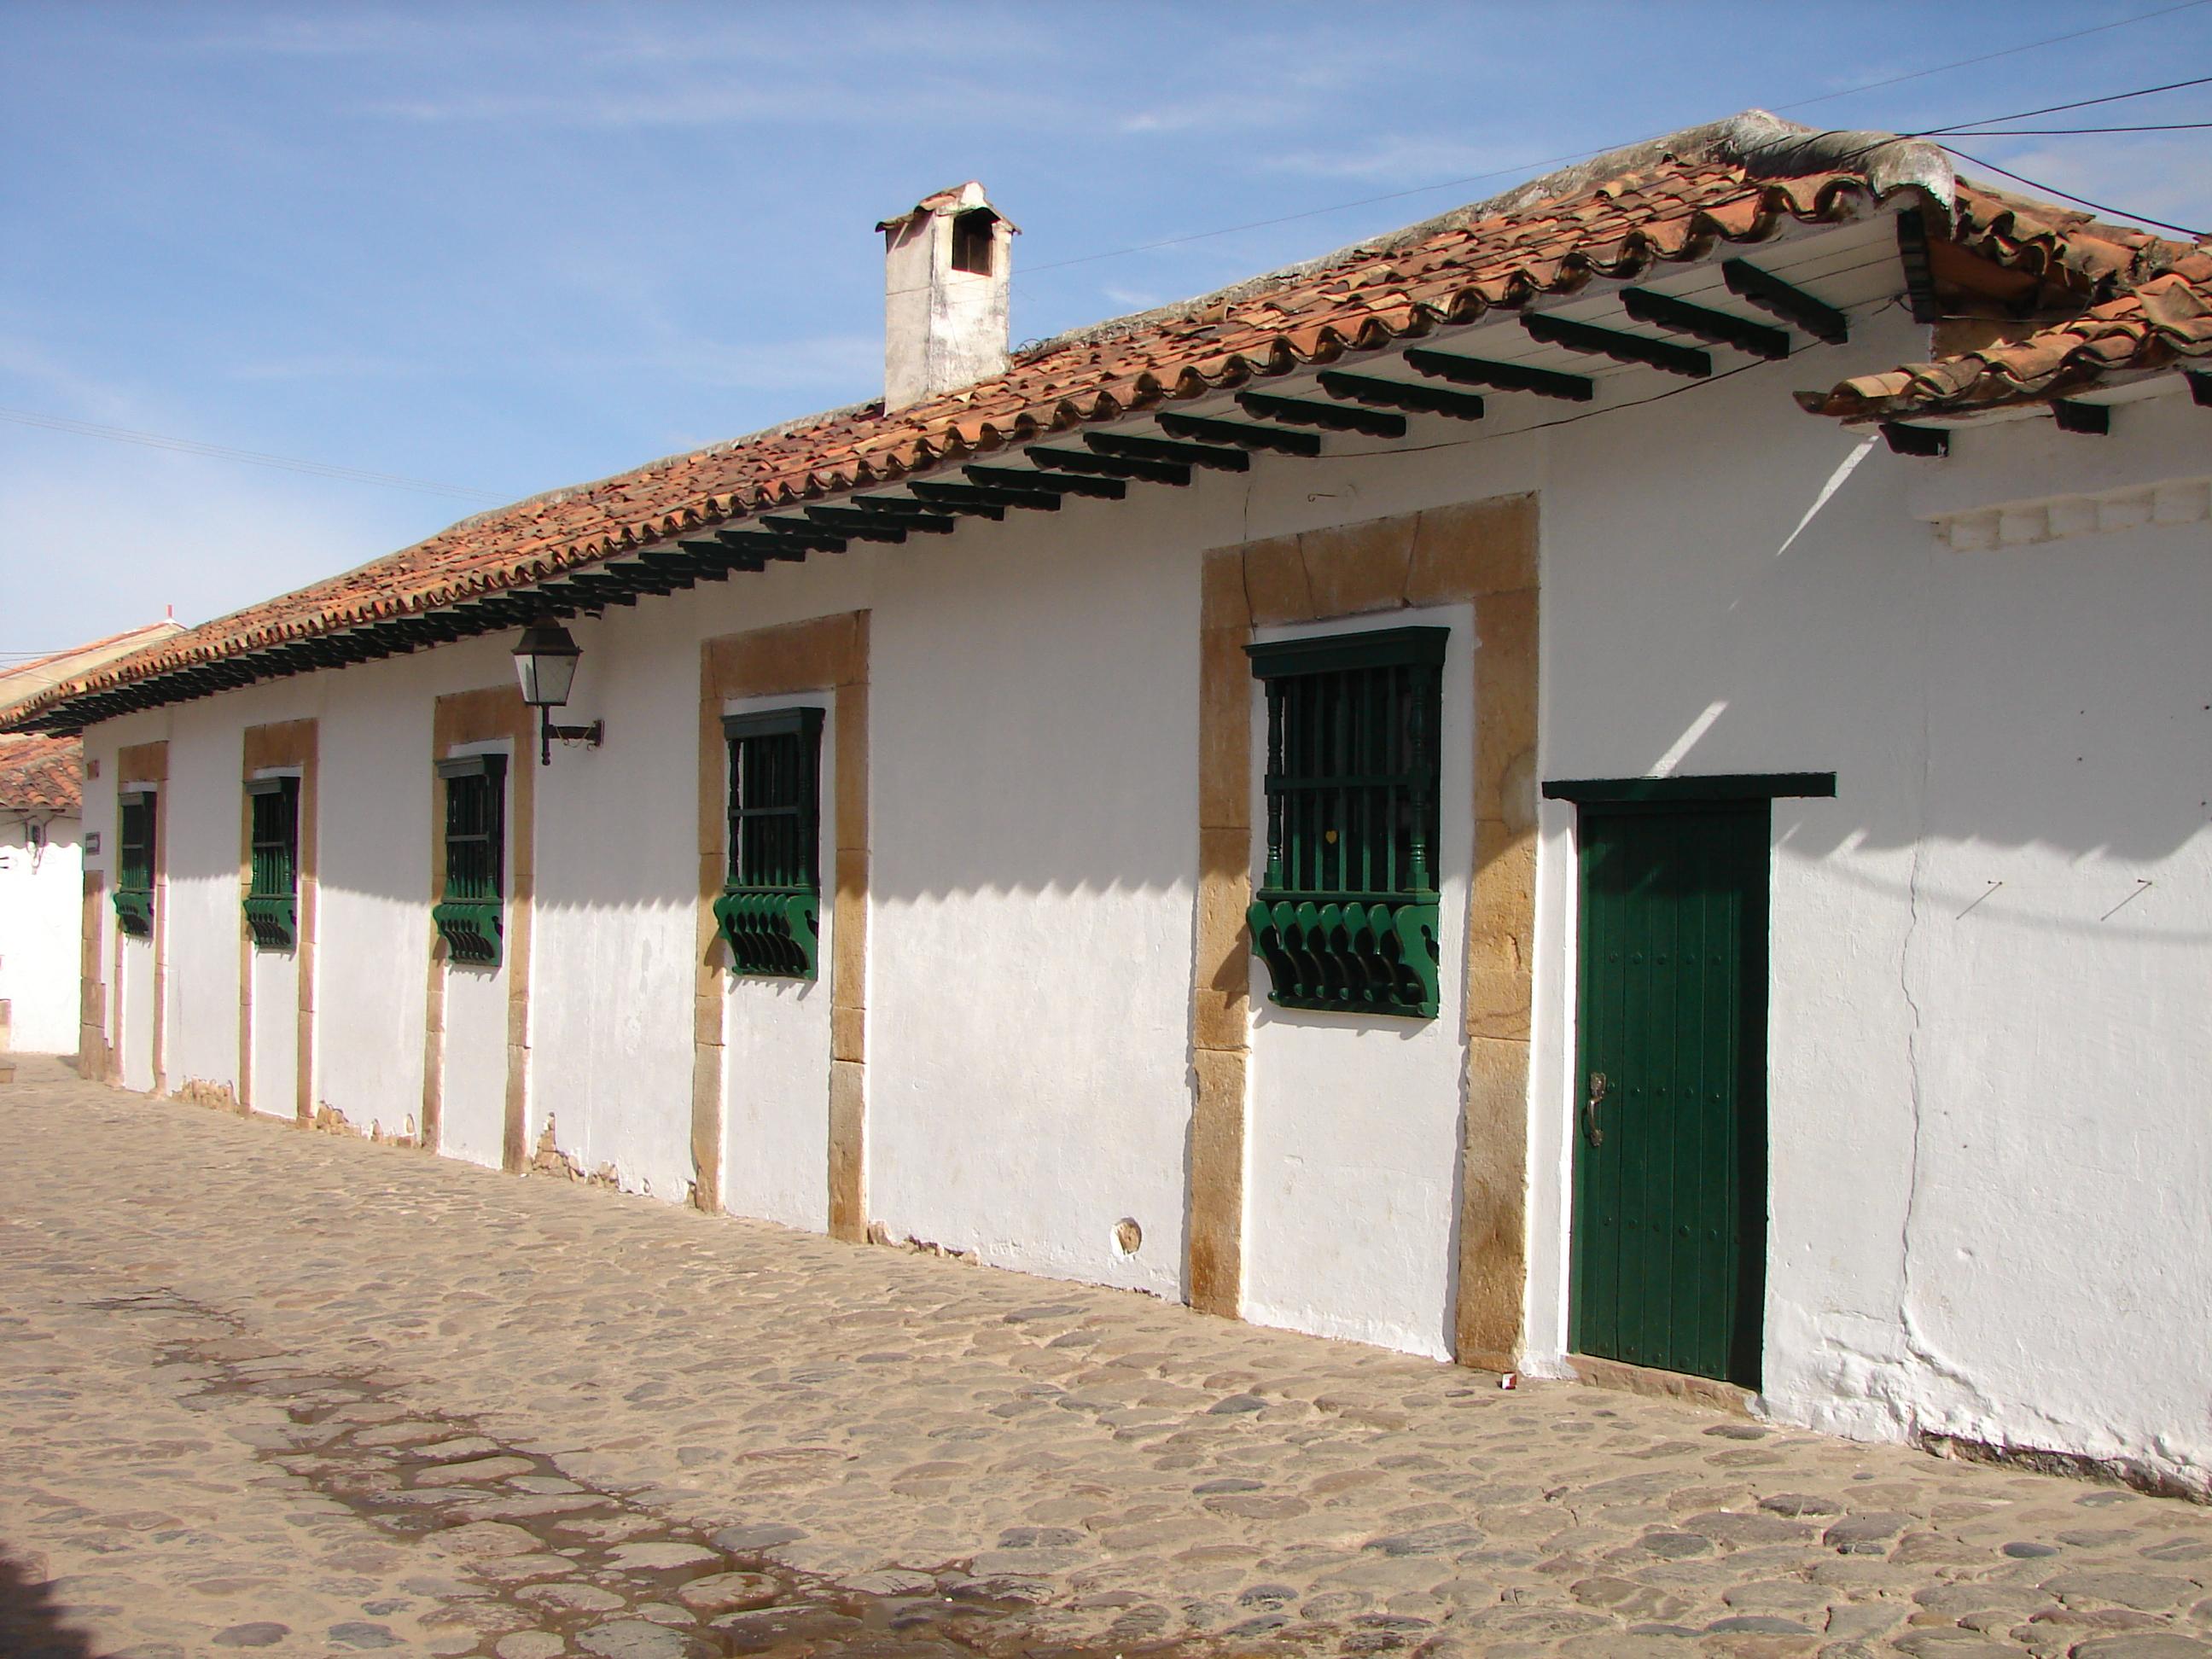 Archivo casa villa de leyva cra 9 wikipedia for Casa la villa